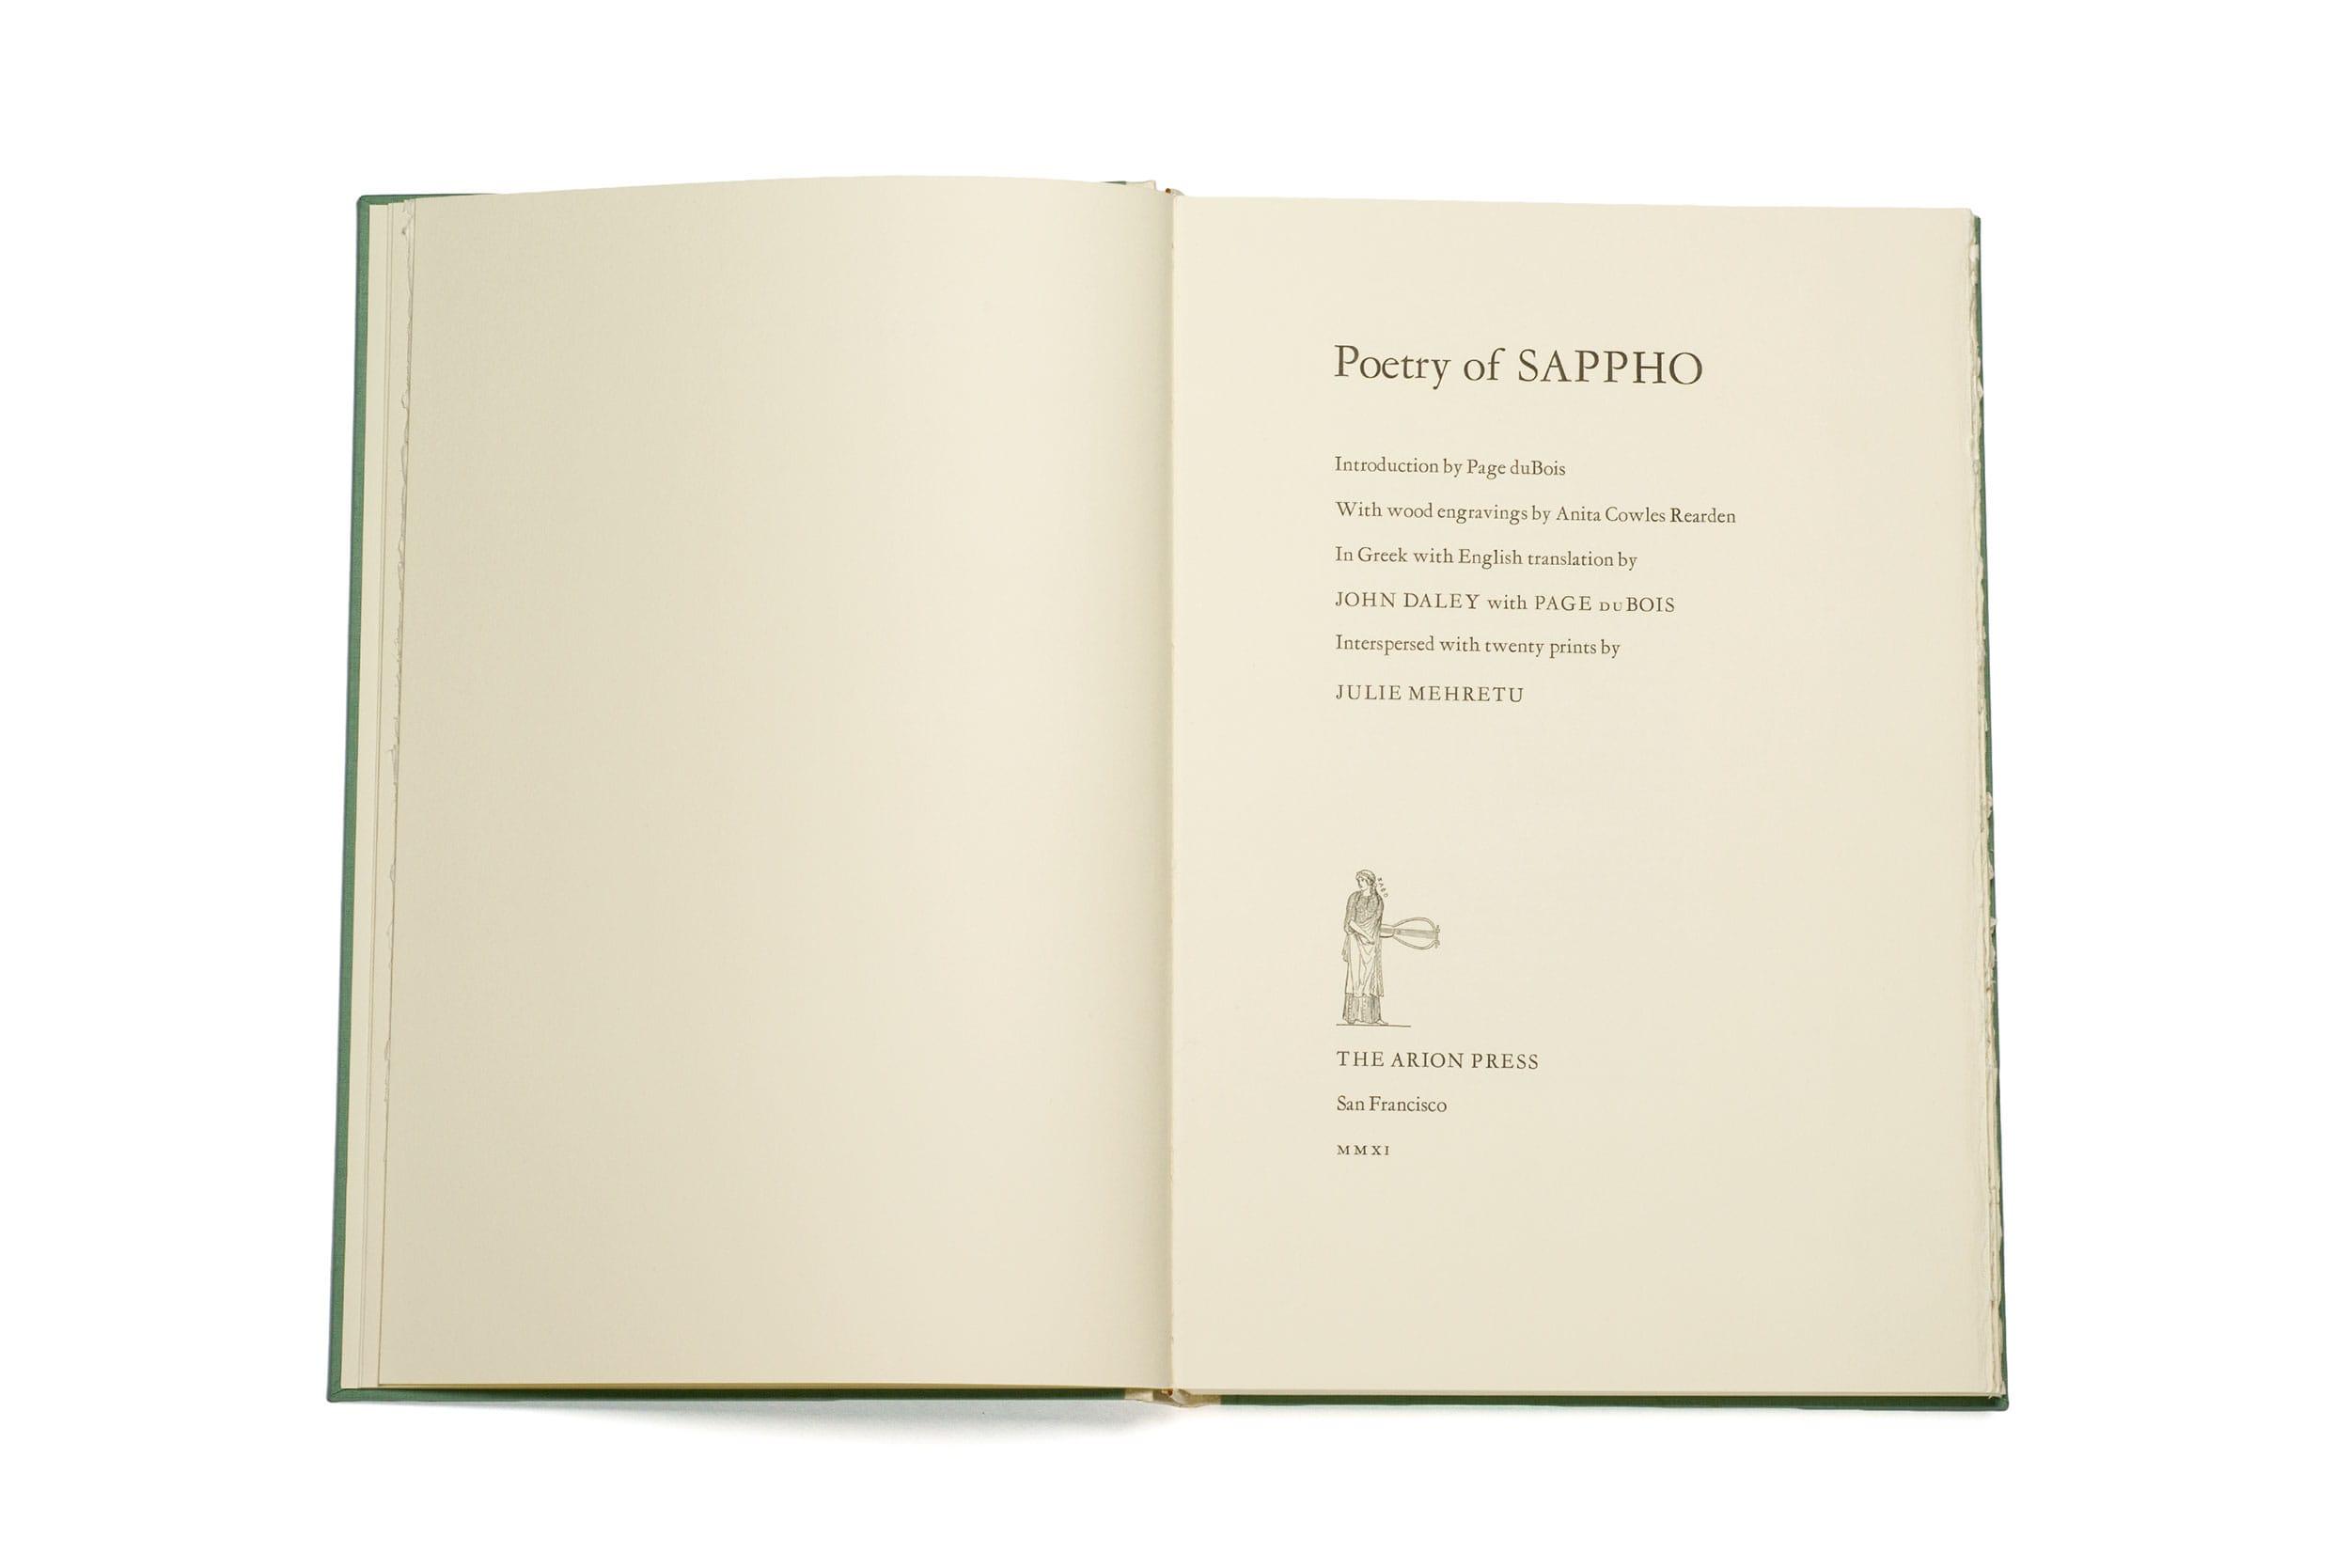 093_Poetry_of_Sappho-Title.jpg